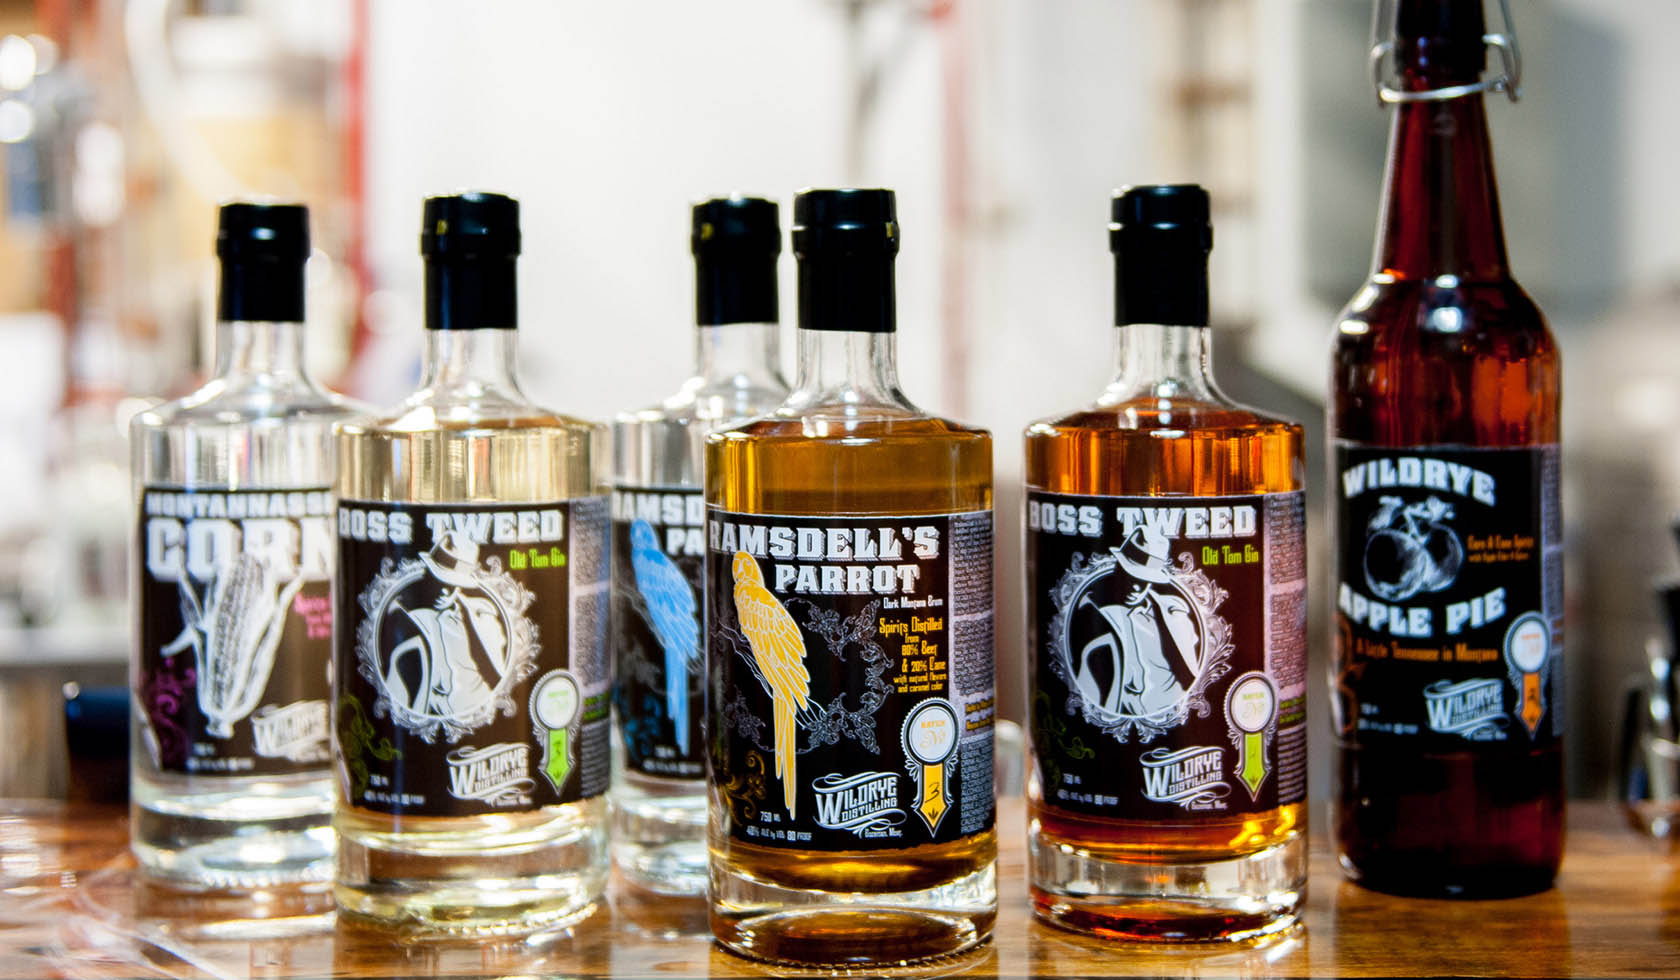 Wildrye Distilling profile image